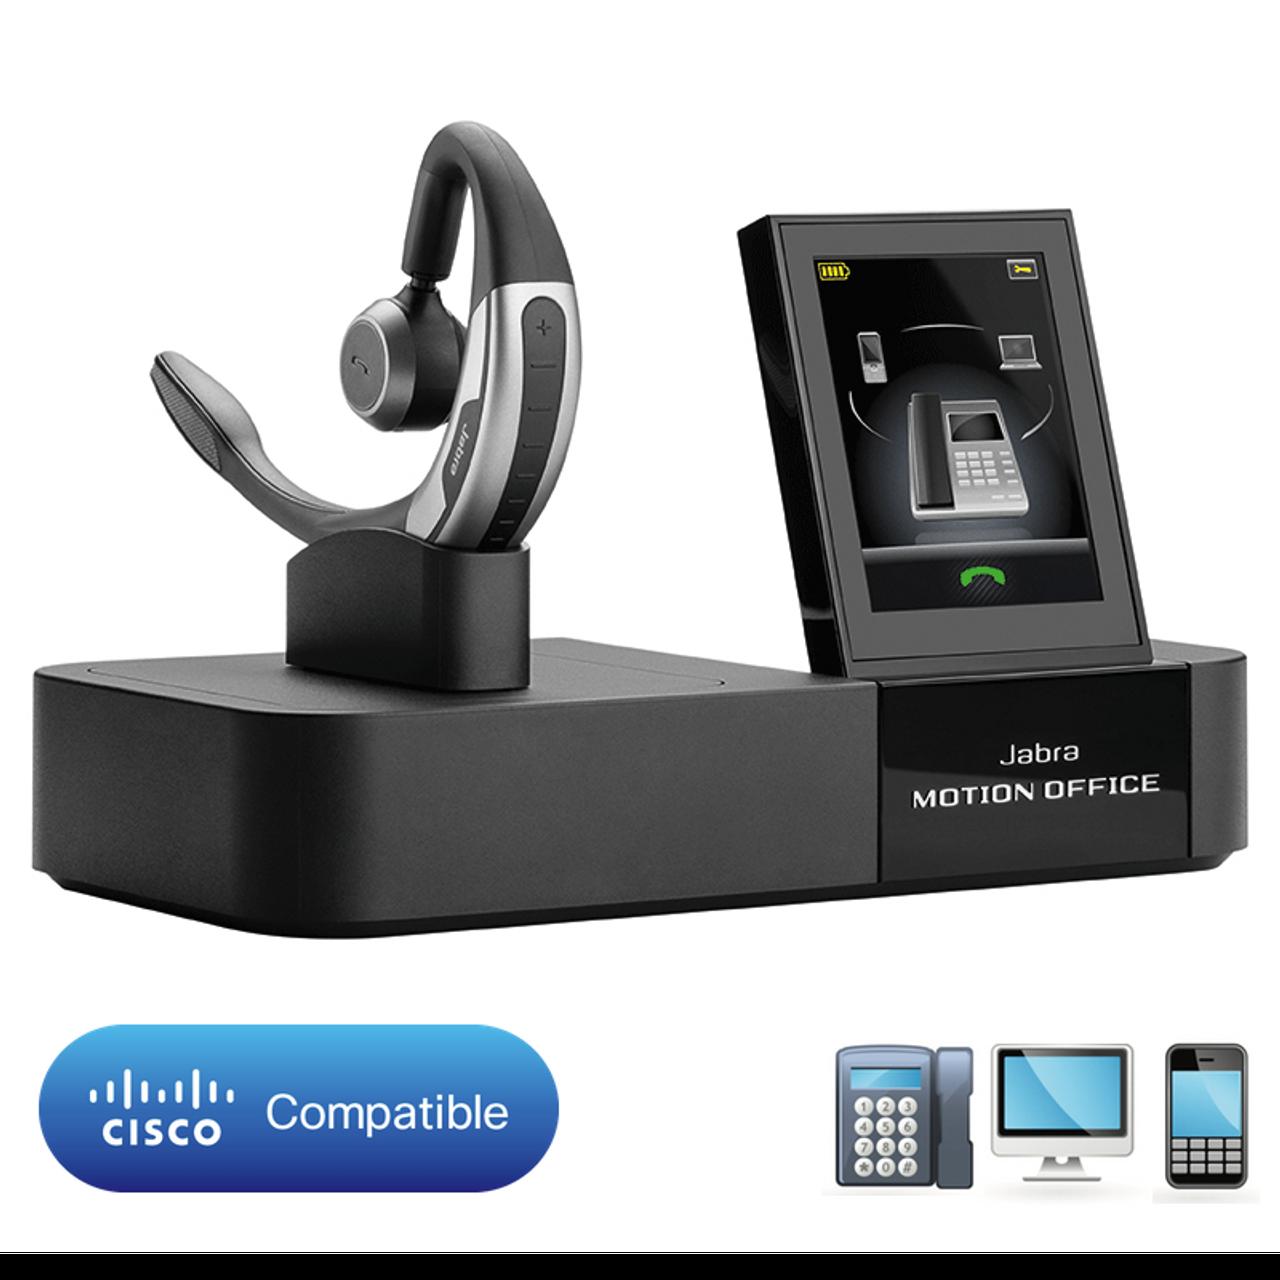 Jabra Motion Office 6670 904 105 Gn6670 Bluetooth Wireless Headset Desk And Smartphone Hot Desk